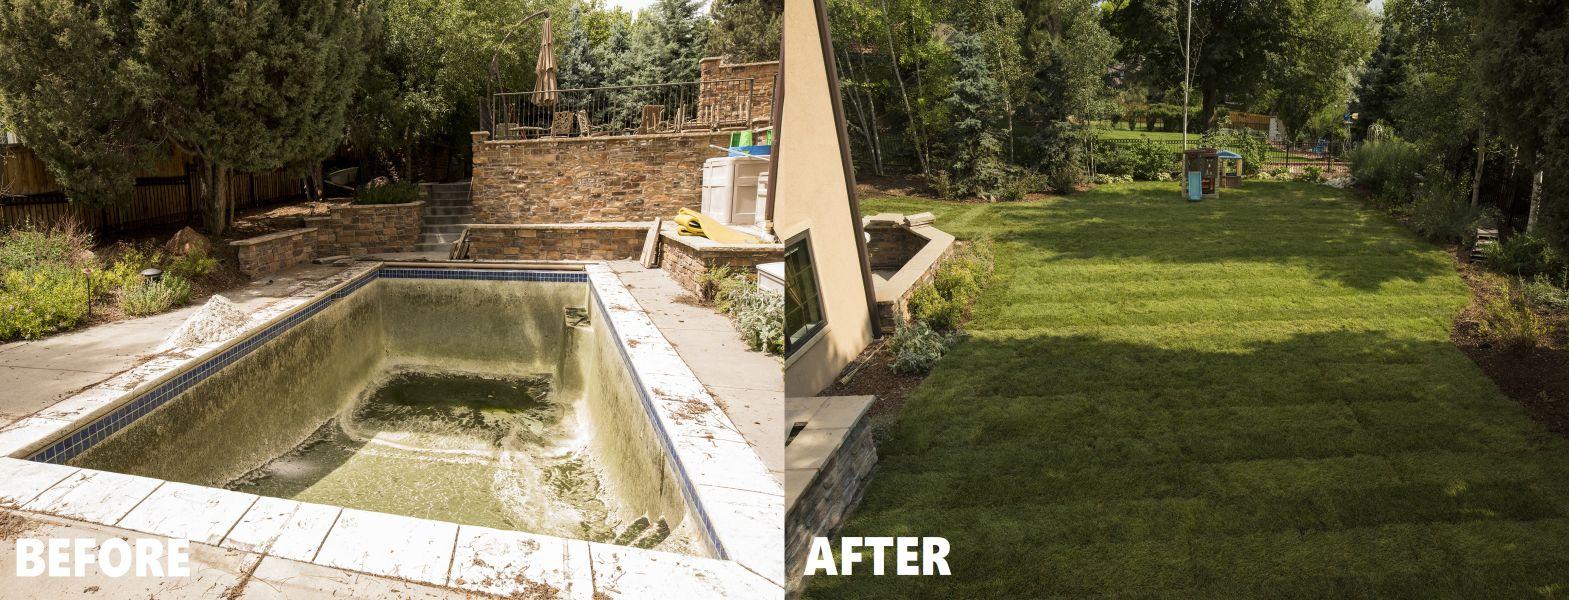 Mack Land LLC - Greenwood Village, CO – Pool Removal